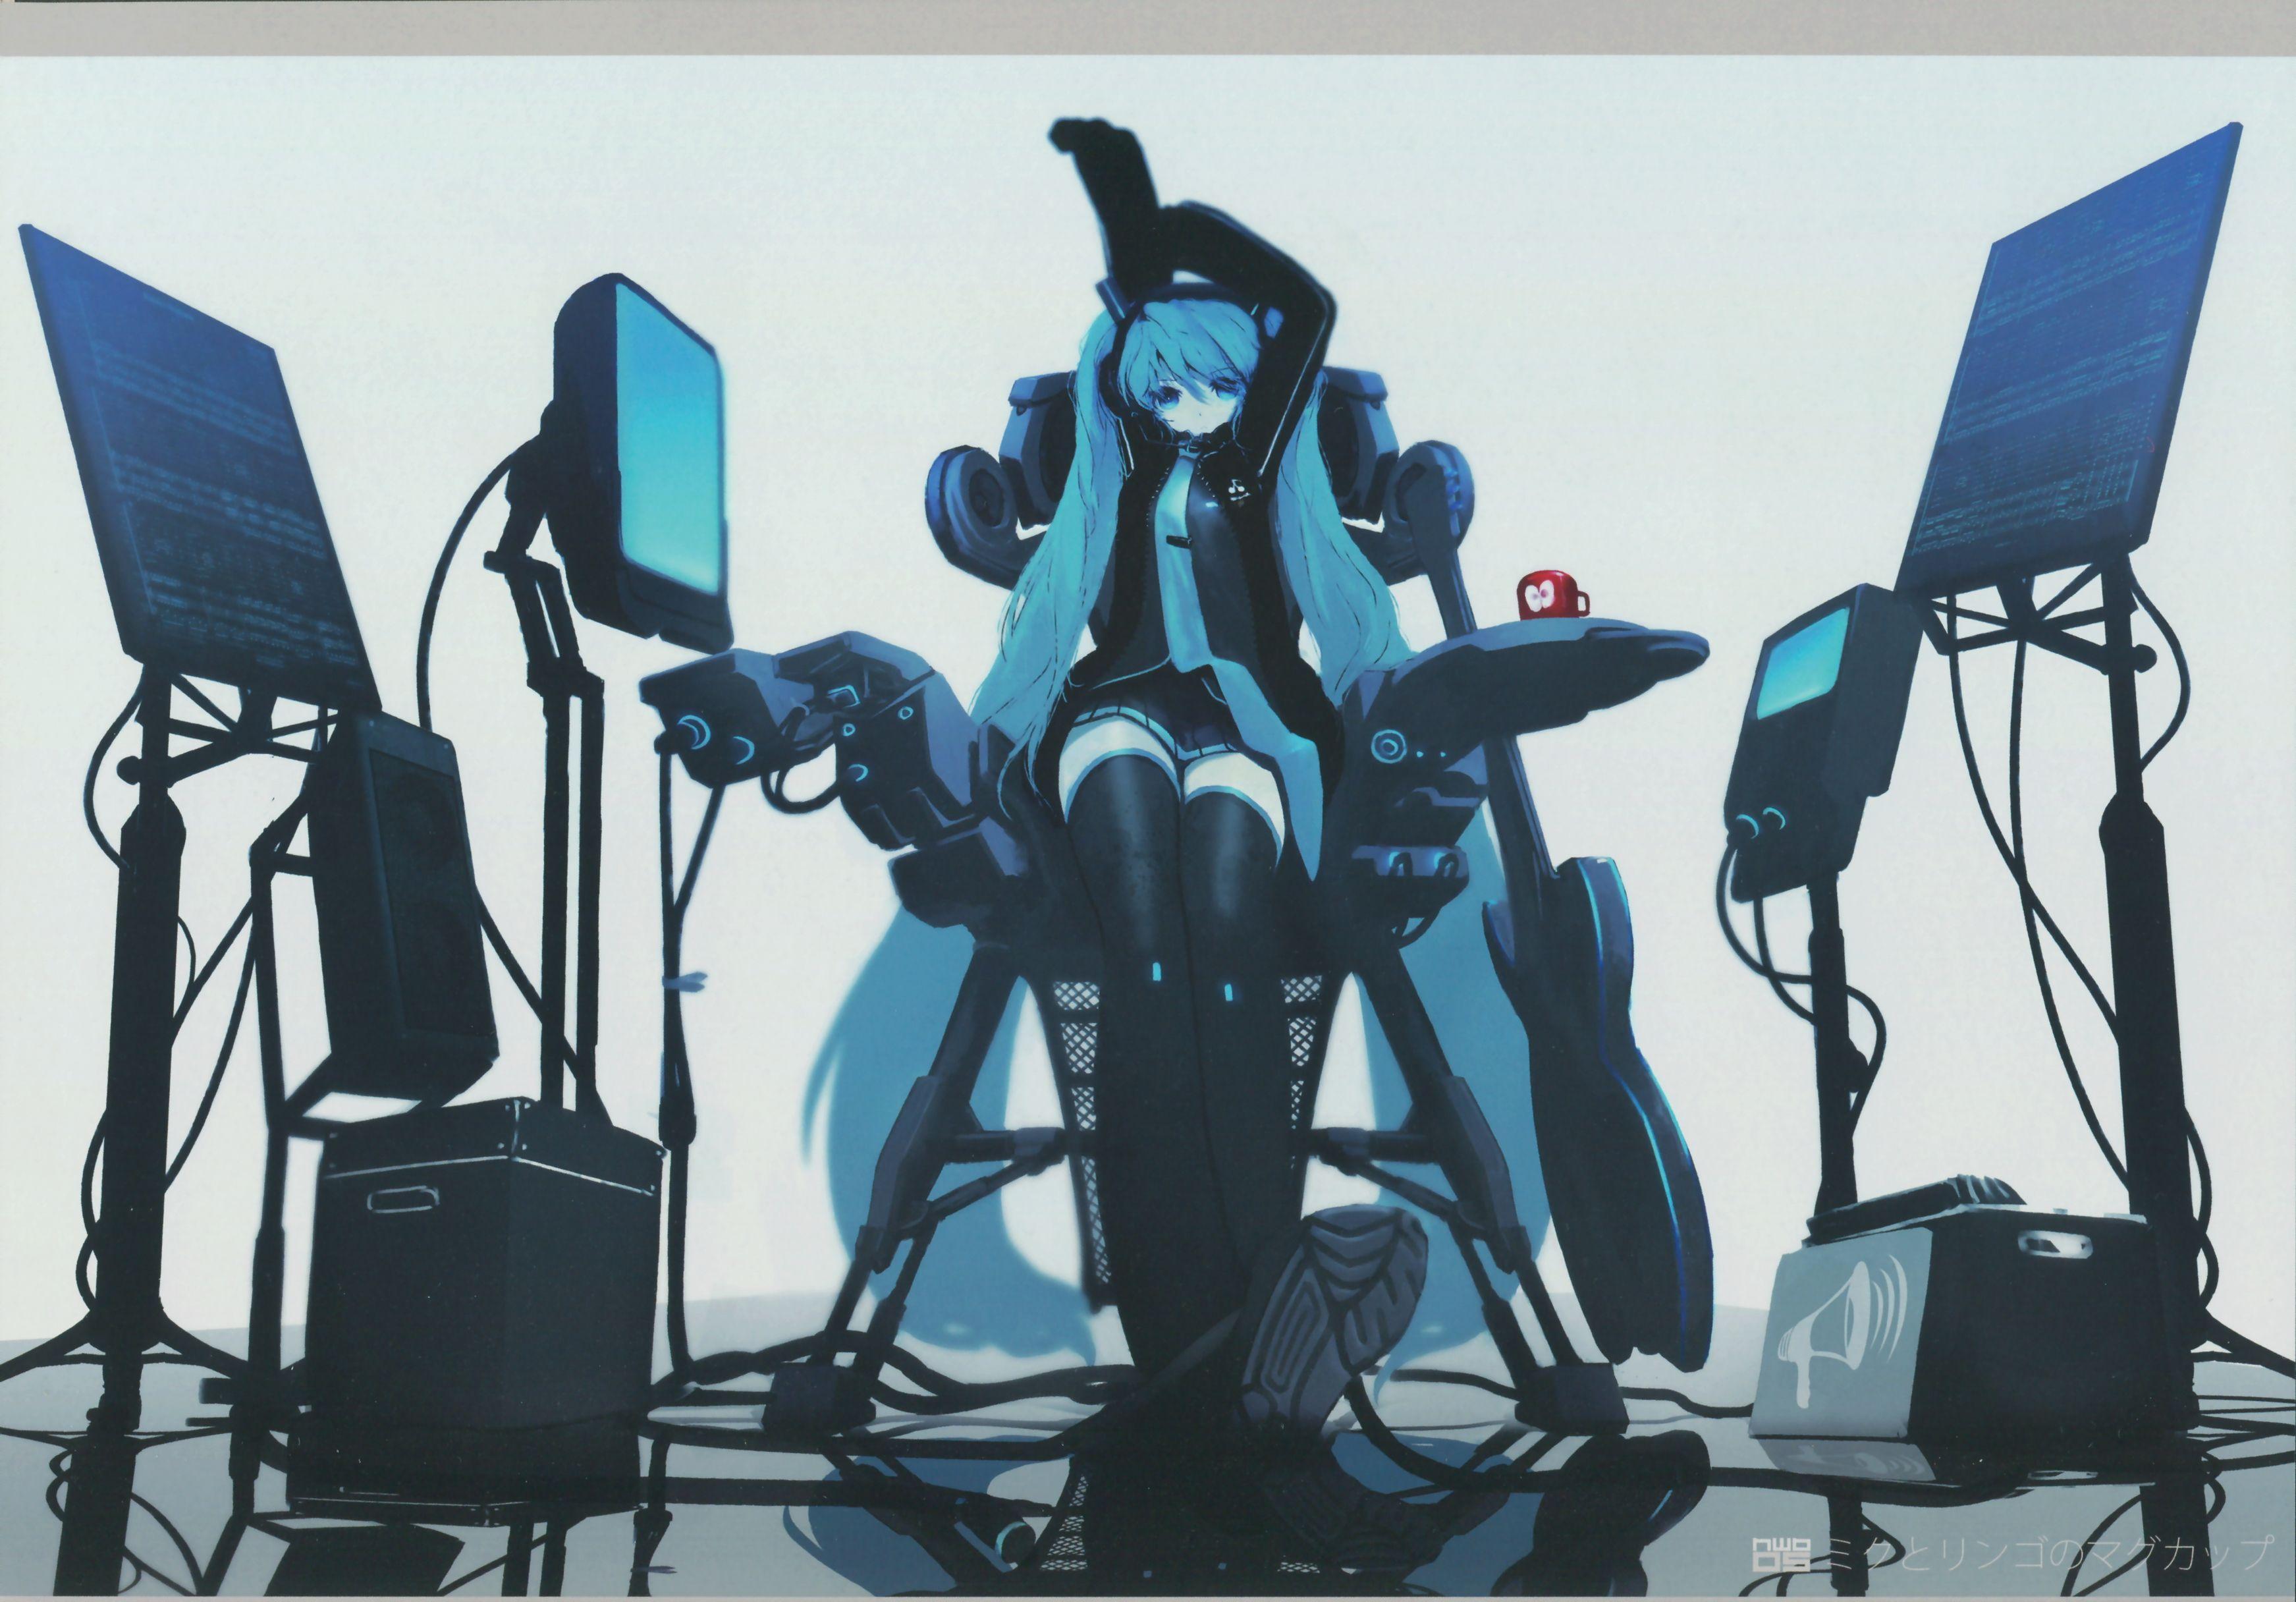 Hatsune Miku Vocaloid digital singer anime Hatsune